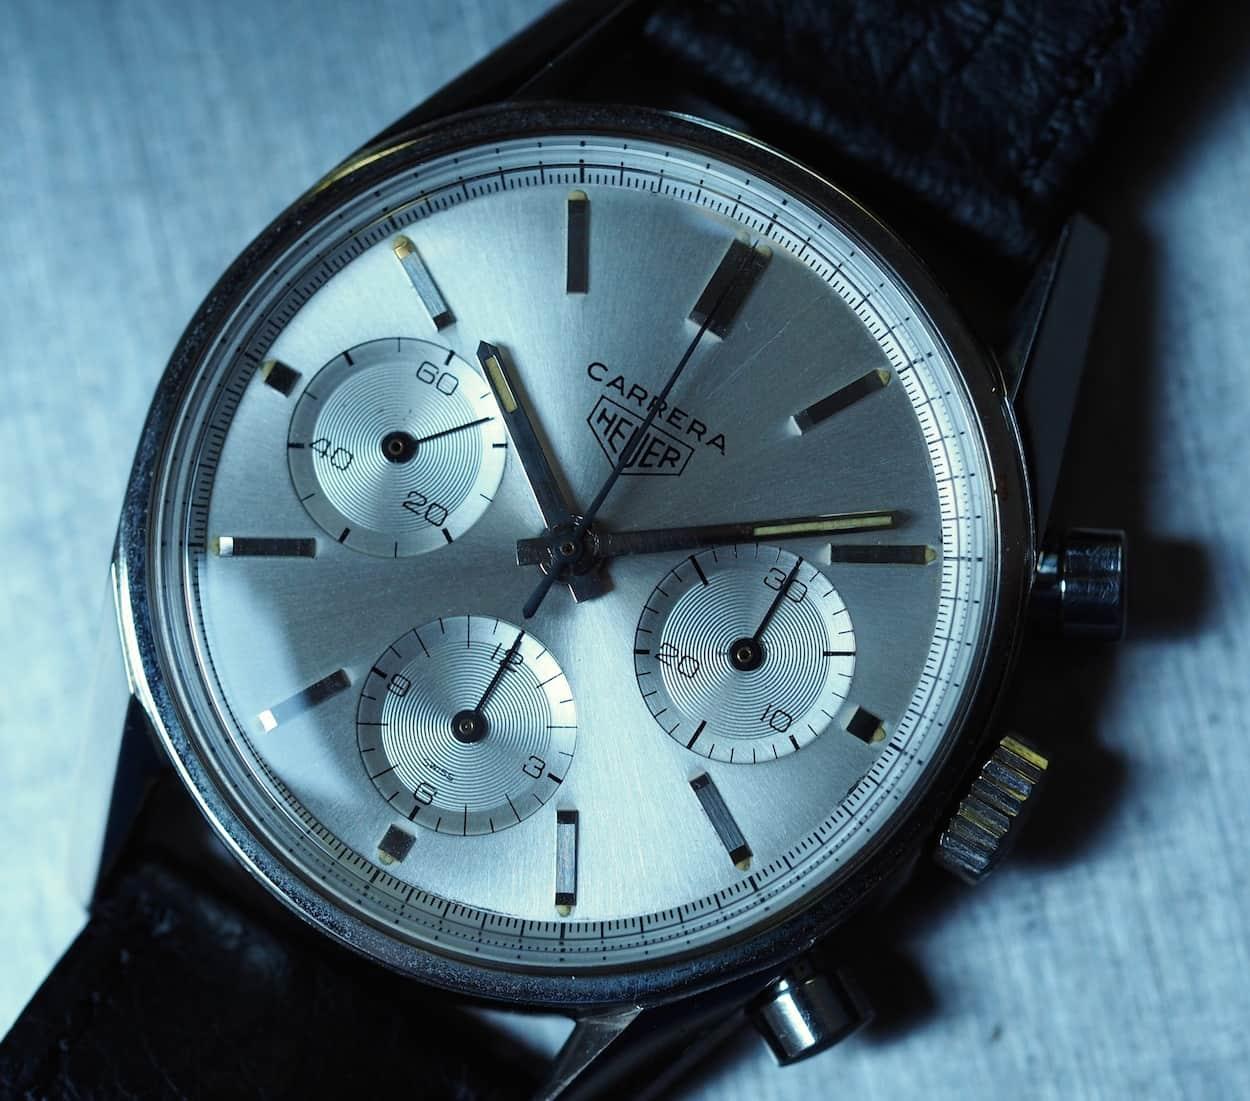 The Heuer Carrera 2447S sunburst dial